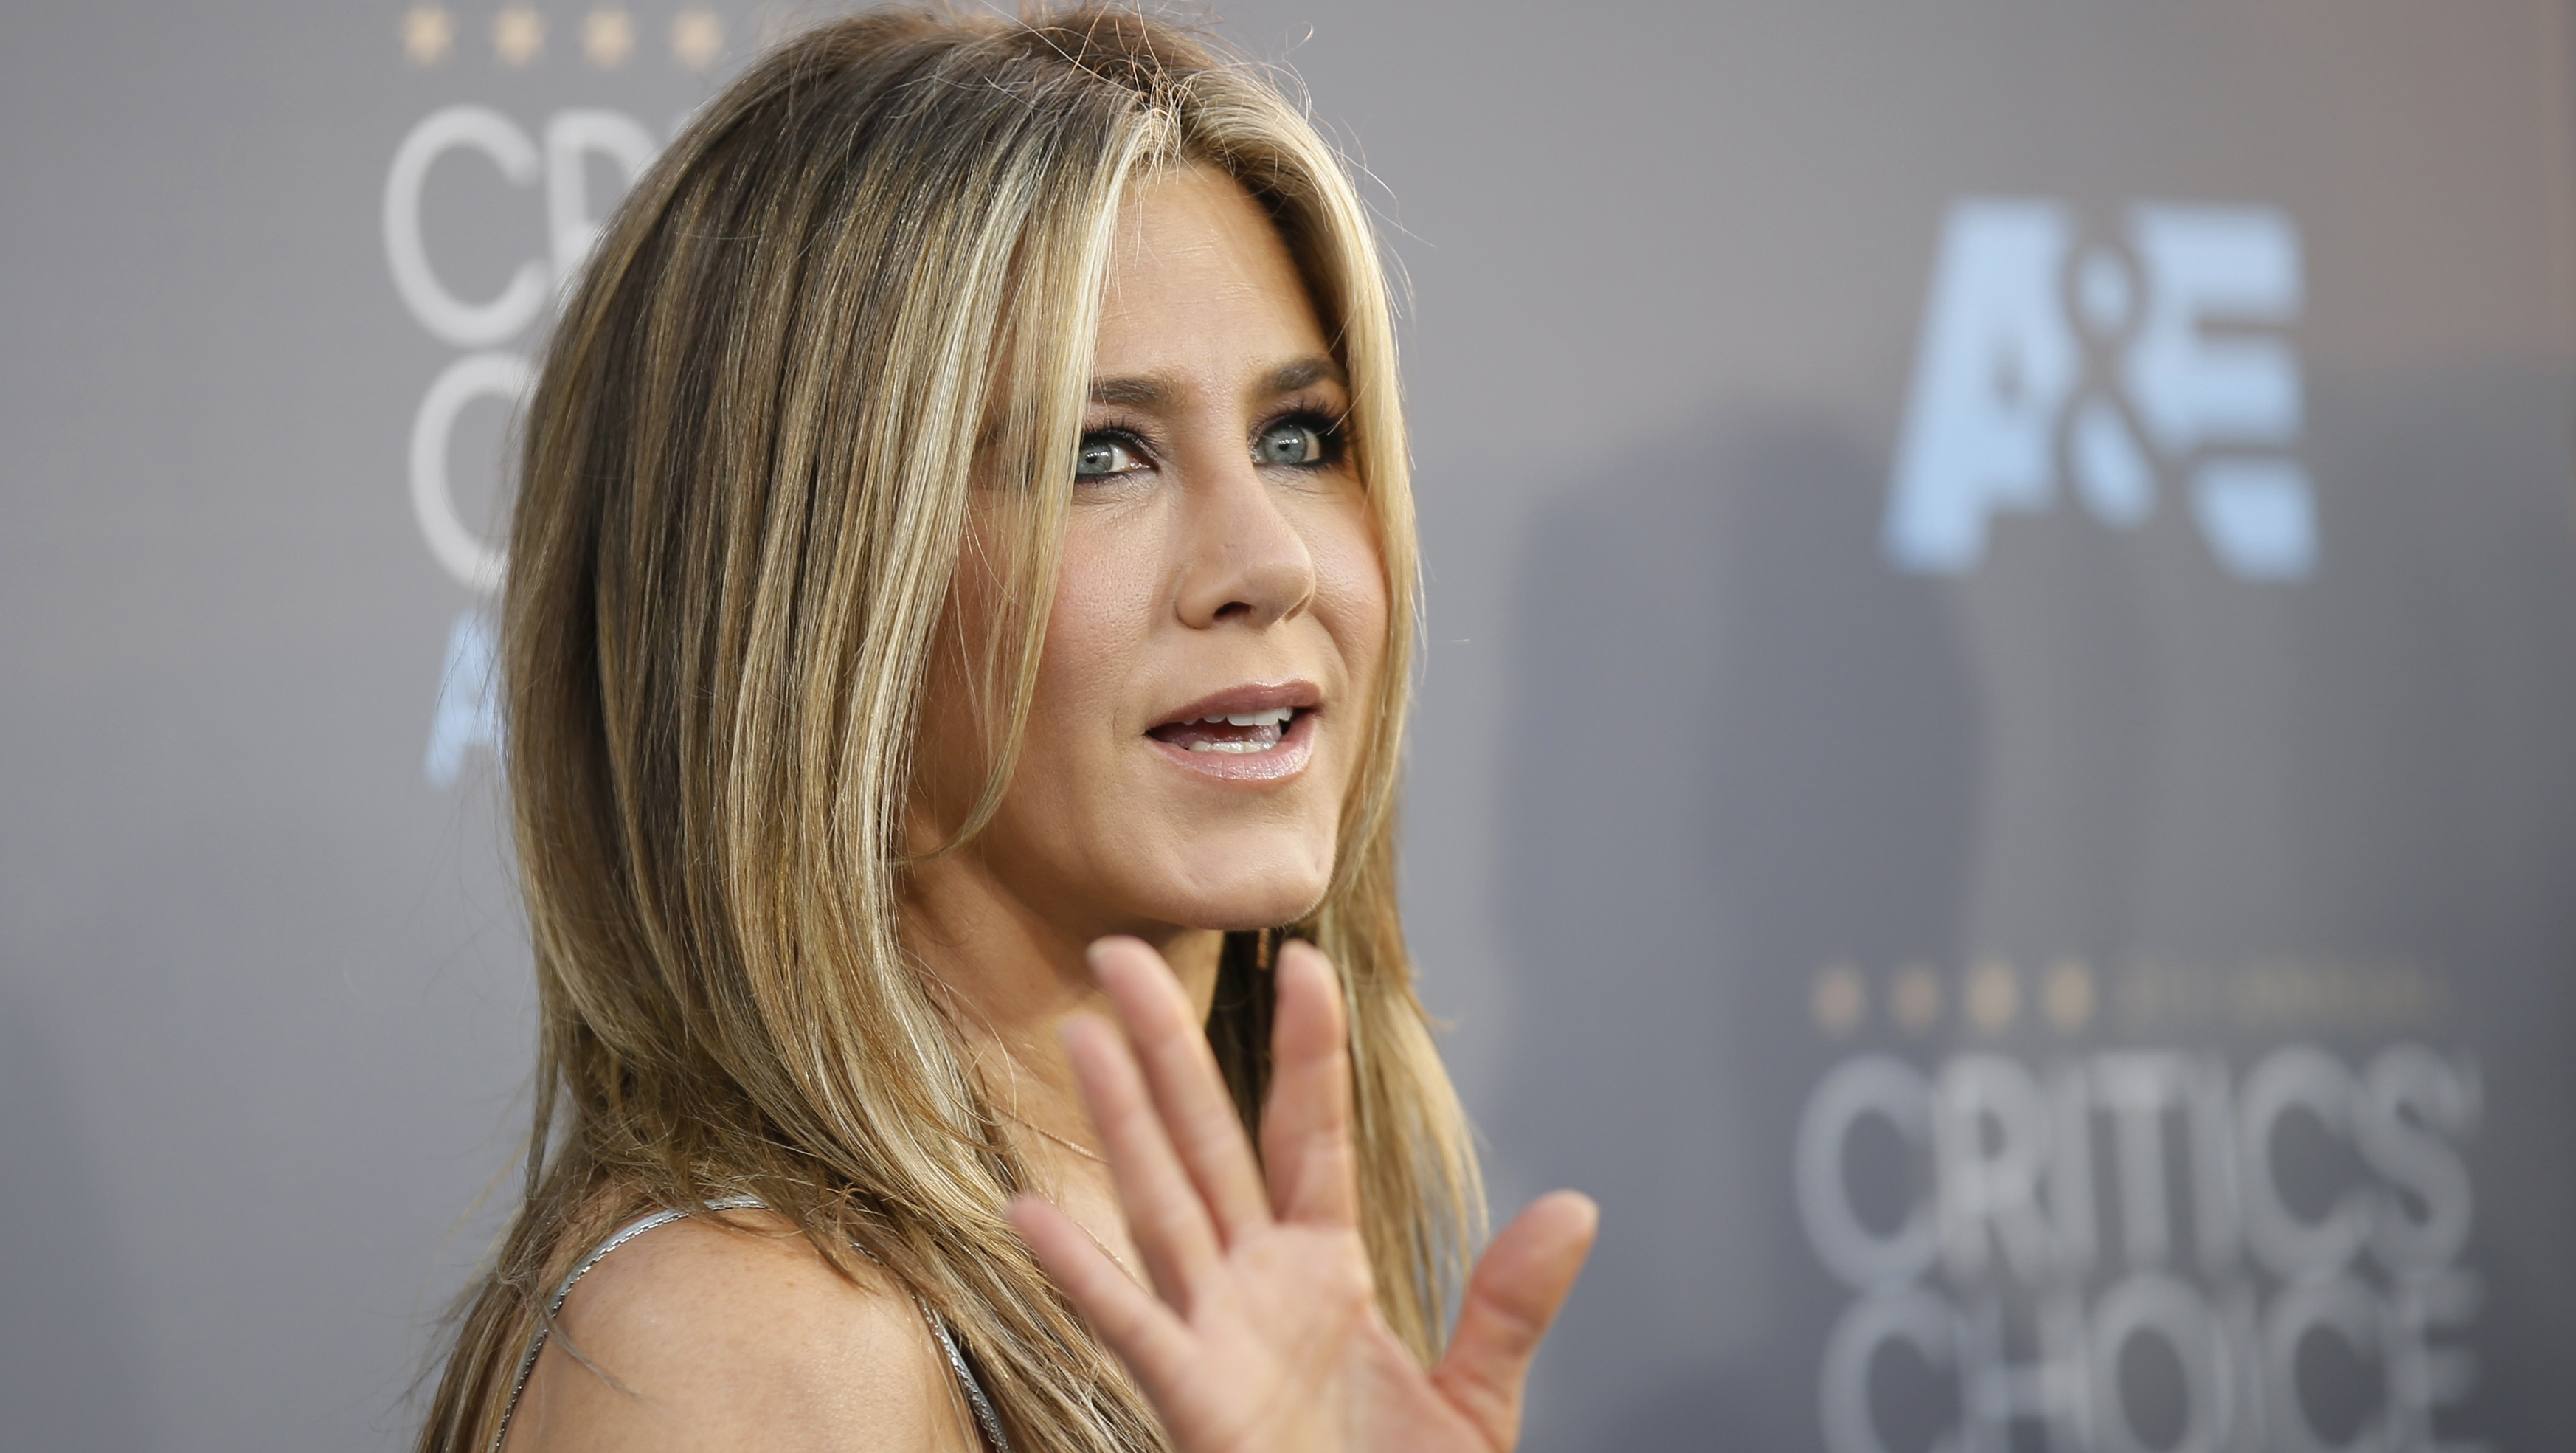 Actress Jennifer Aniston arrives at the 21st Annual Critics' Choice Awards in Santa Monica